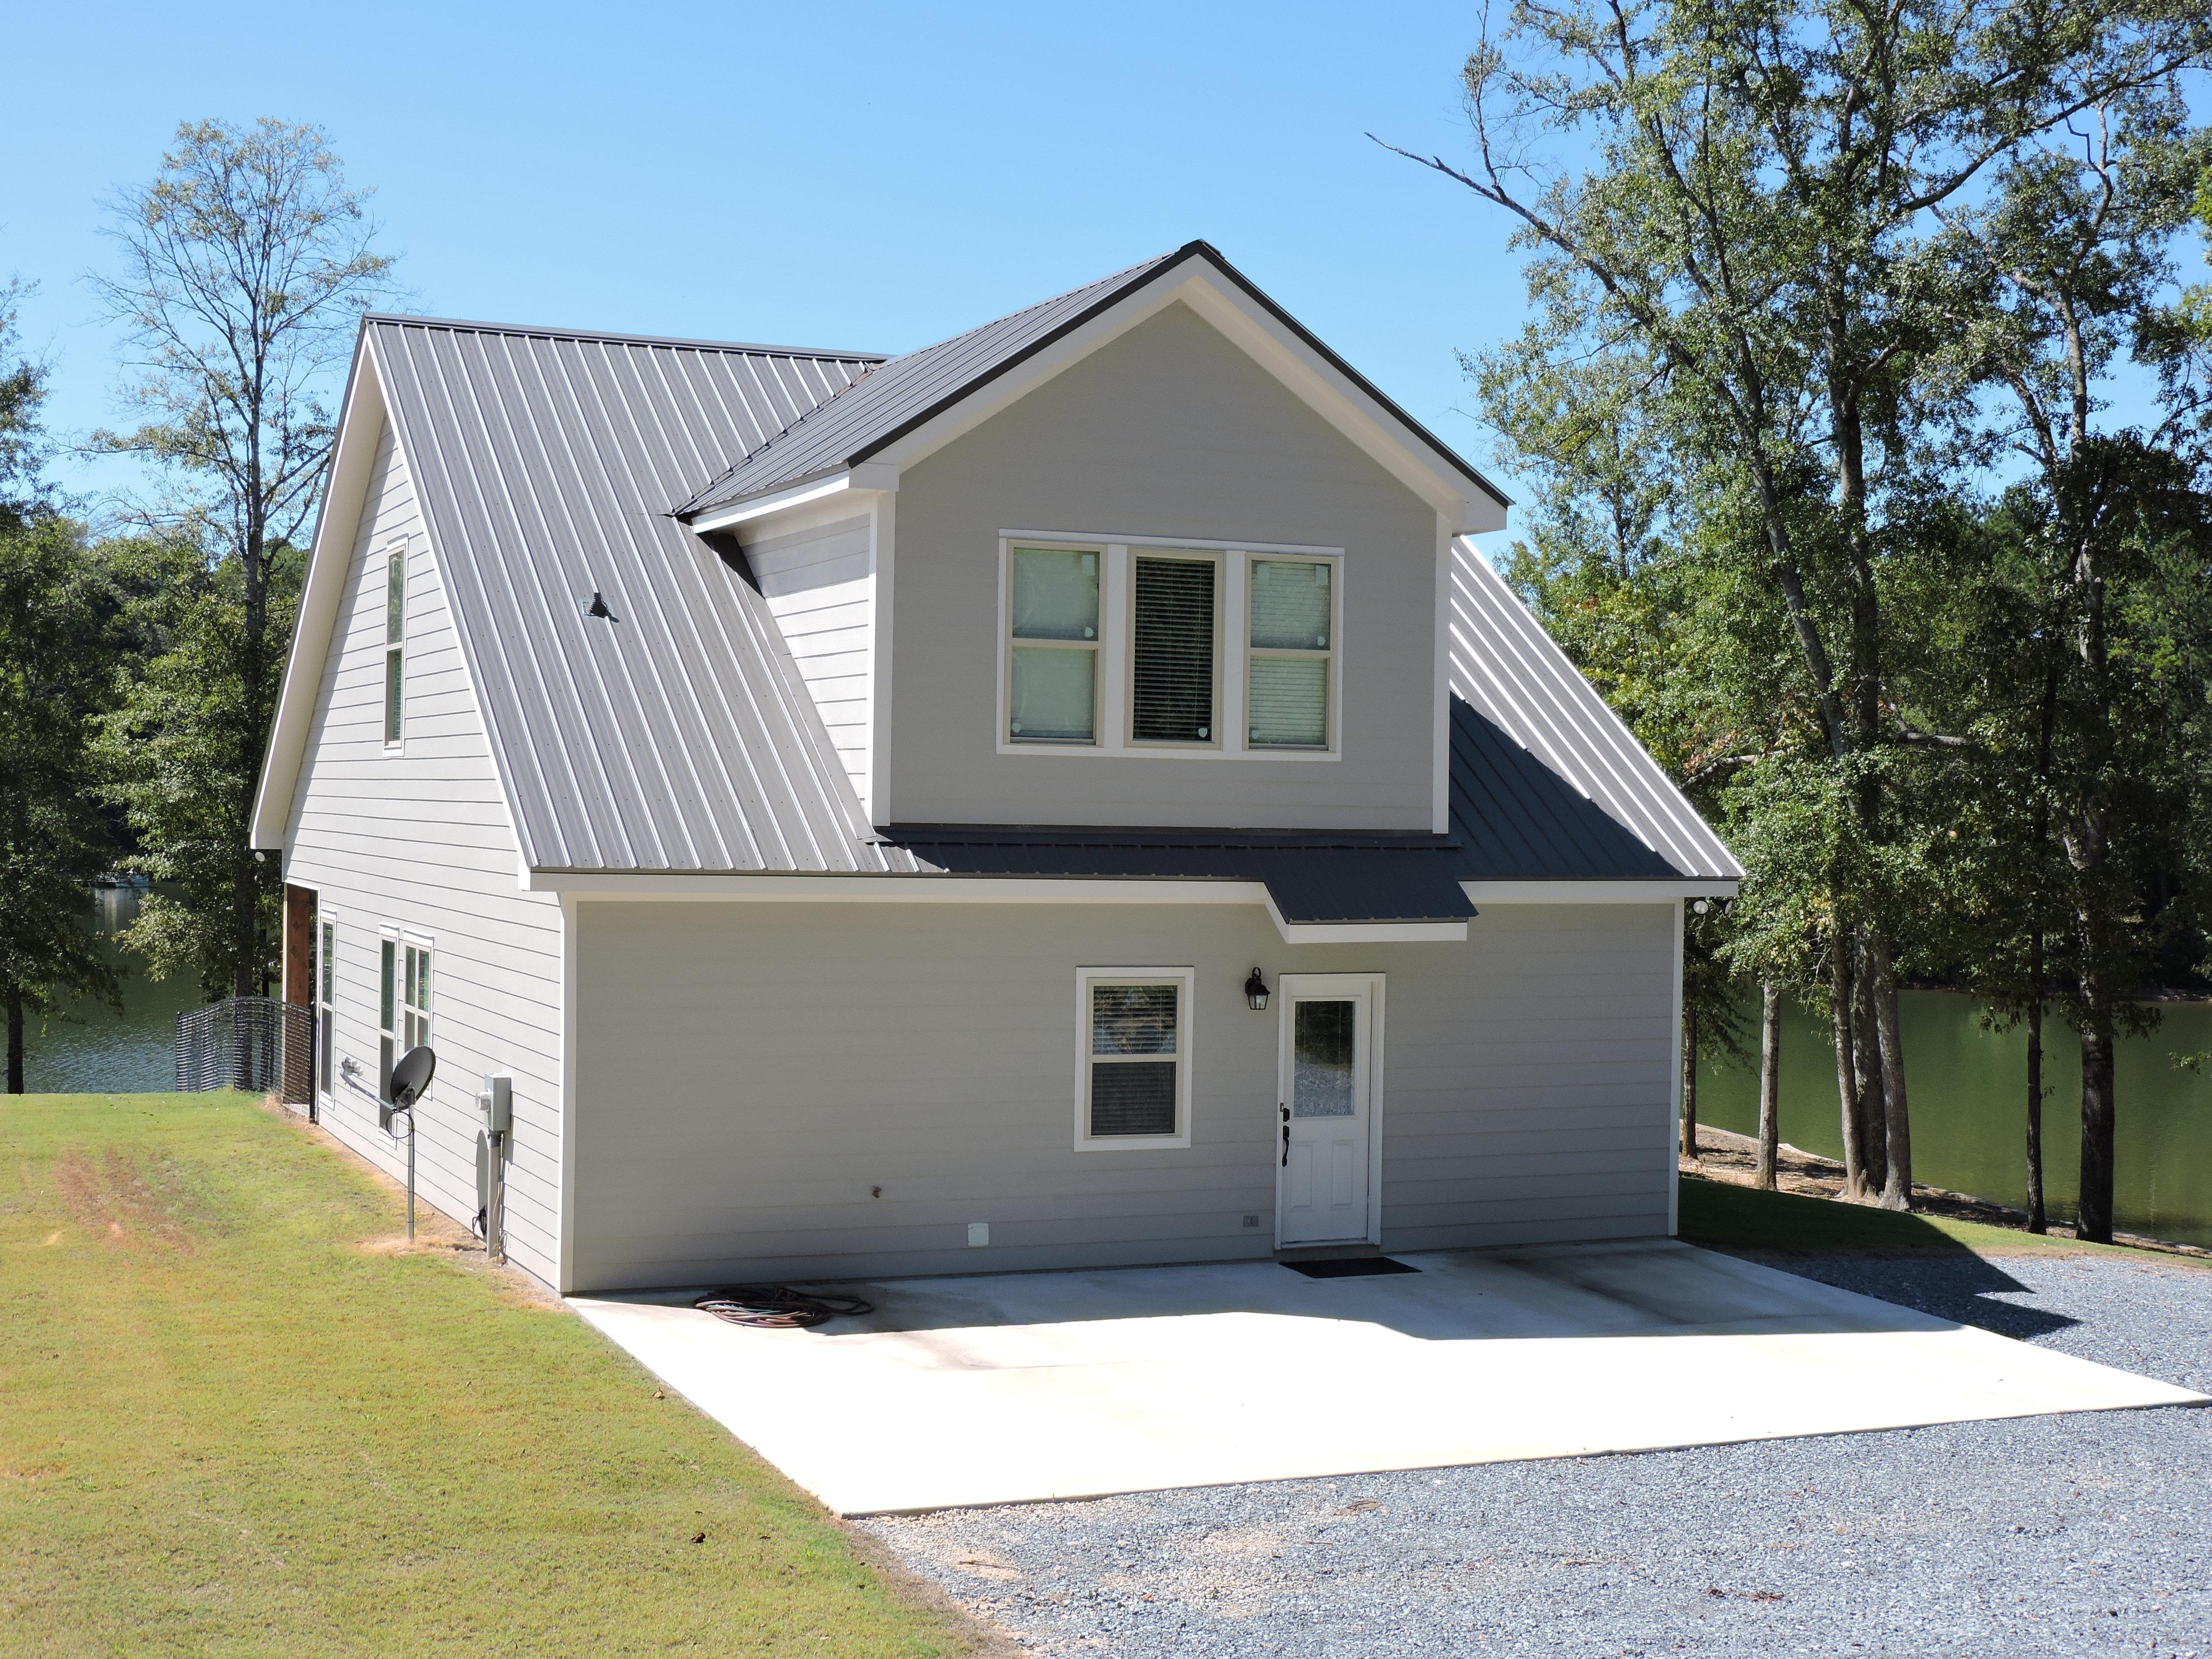 59 Hideaway Circle, Jacksons Gap, Alabama 36861